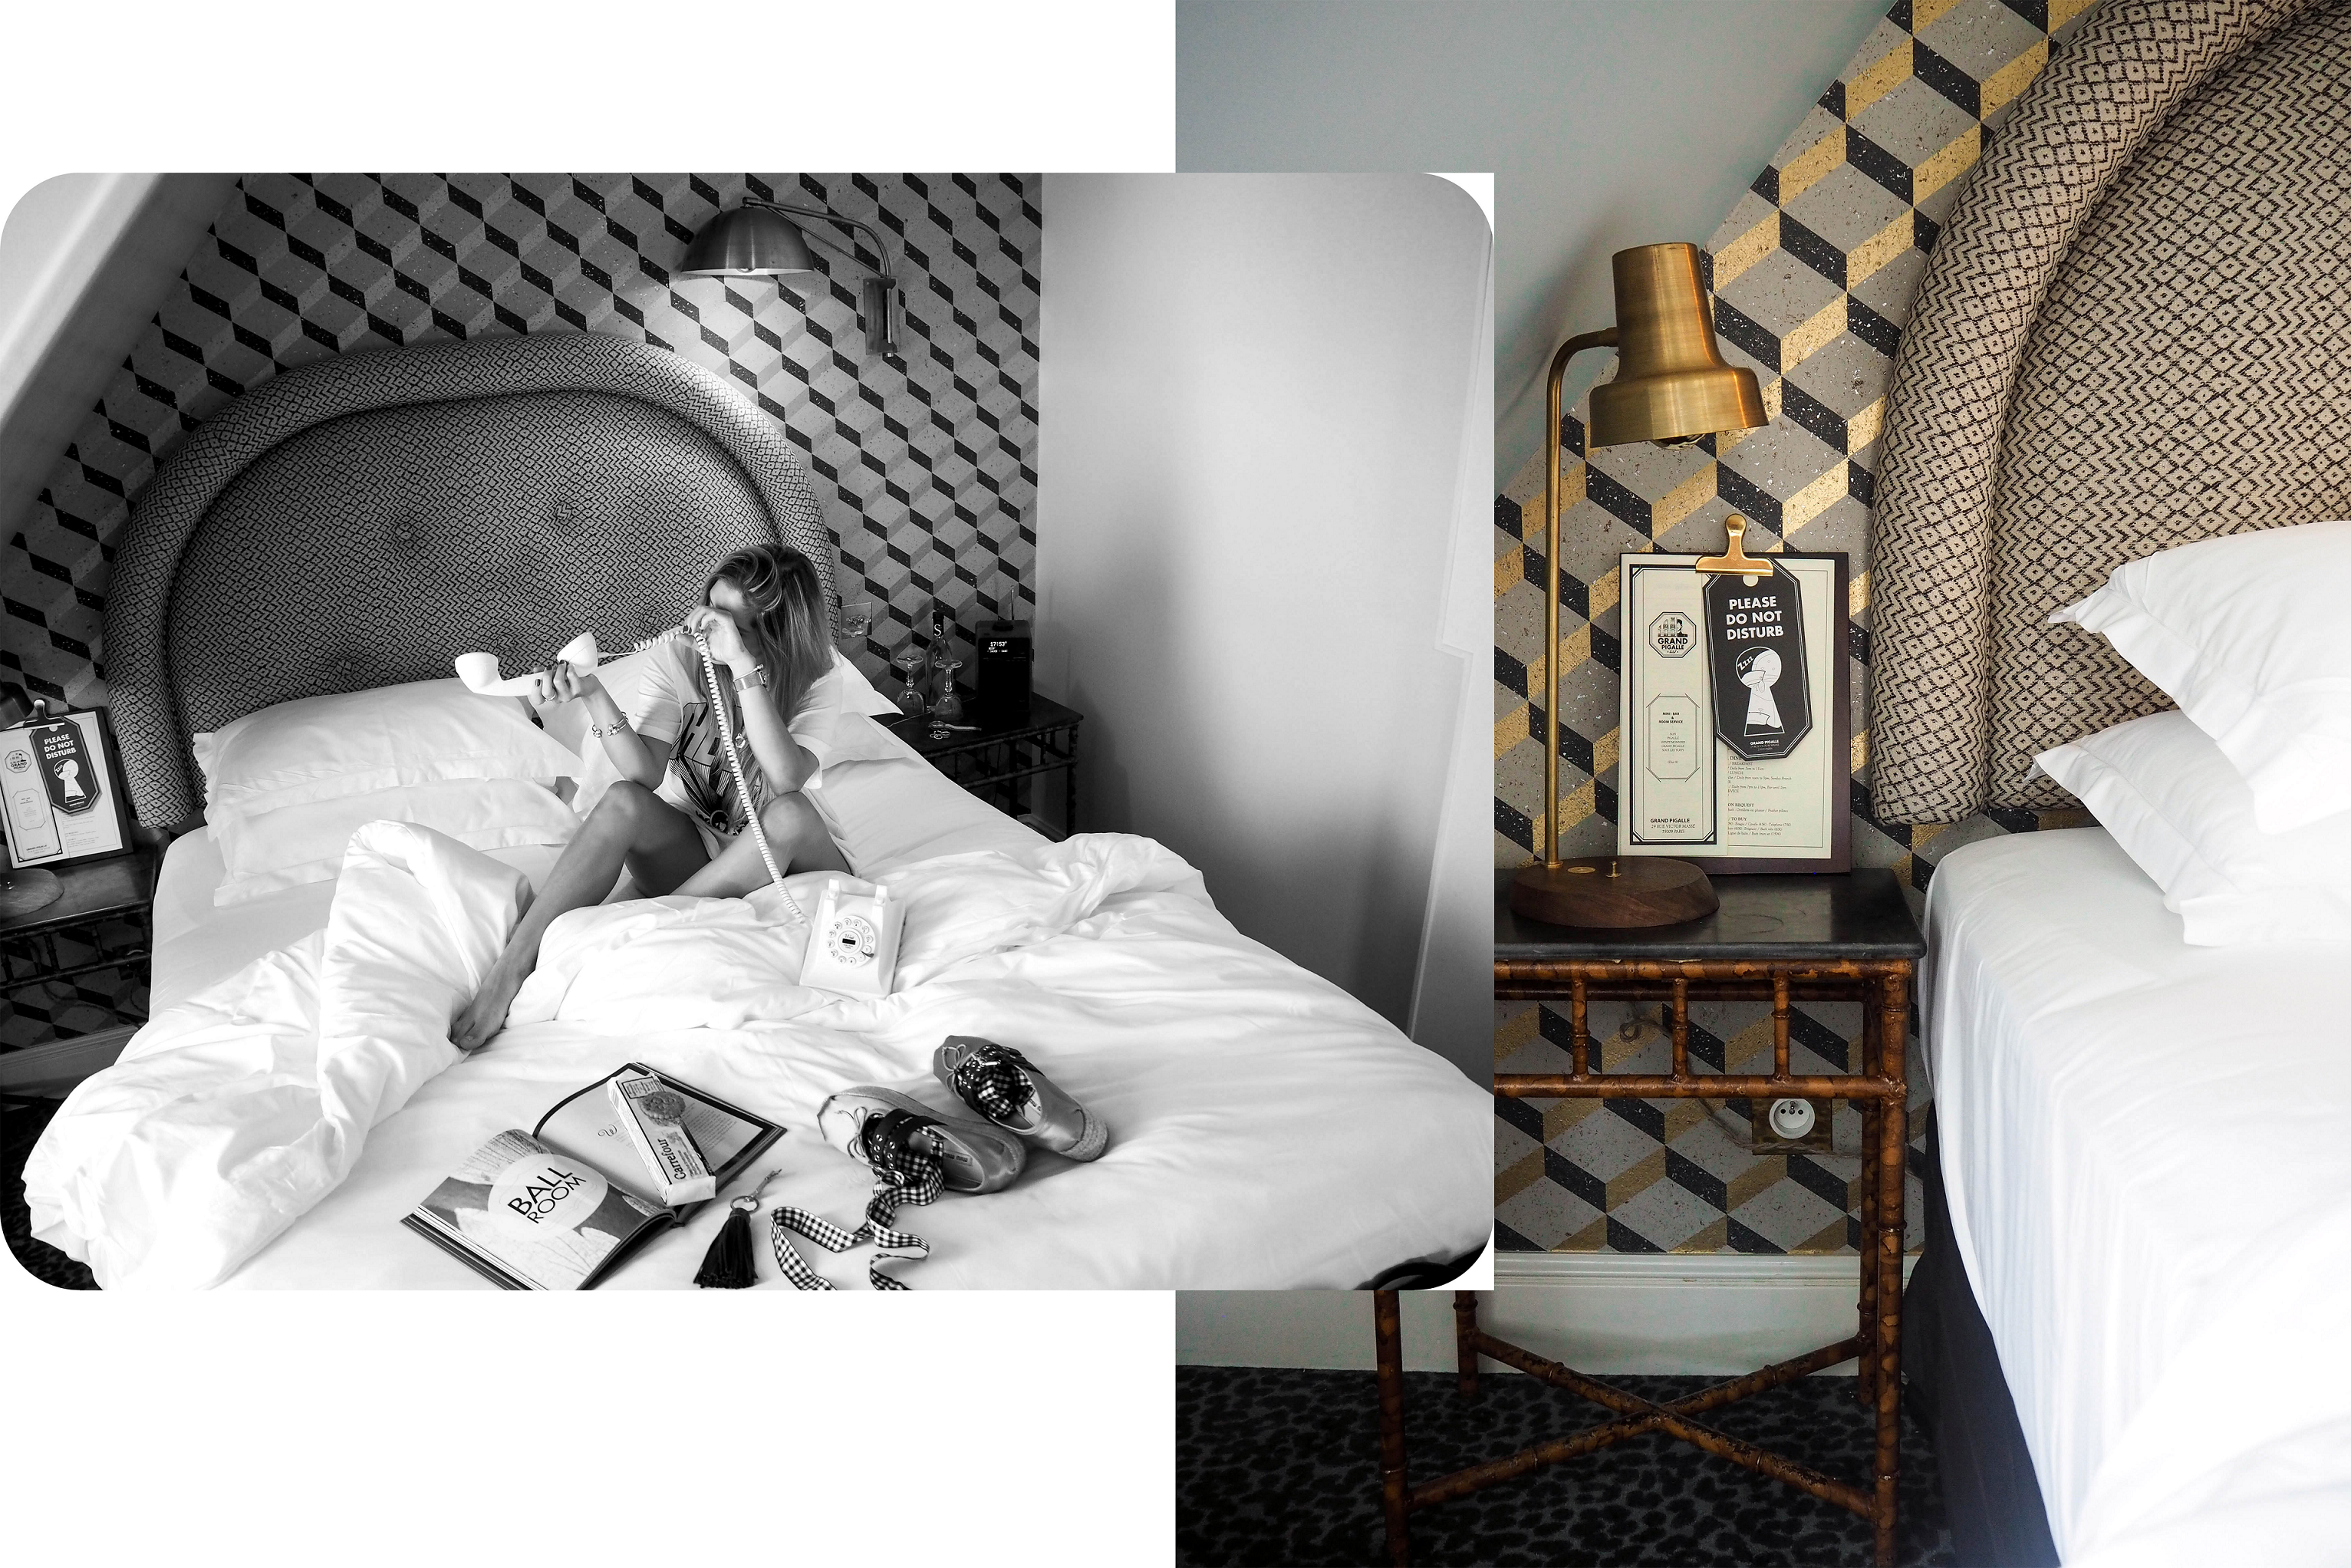 grand pigalle hotel paris review travel blog